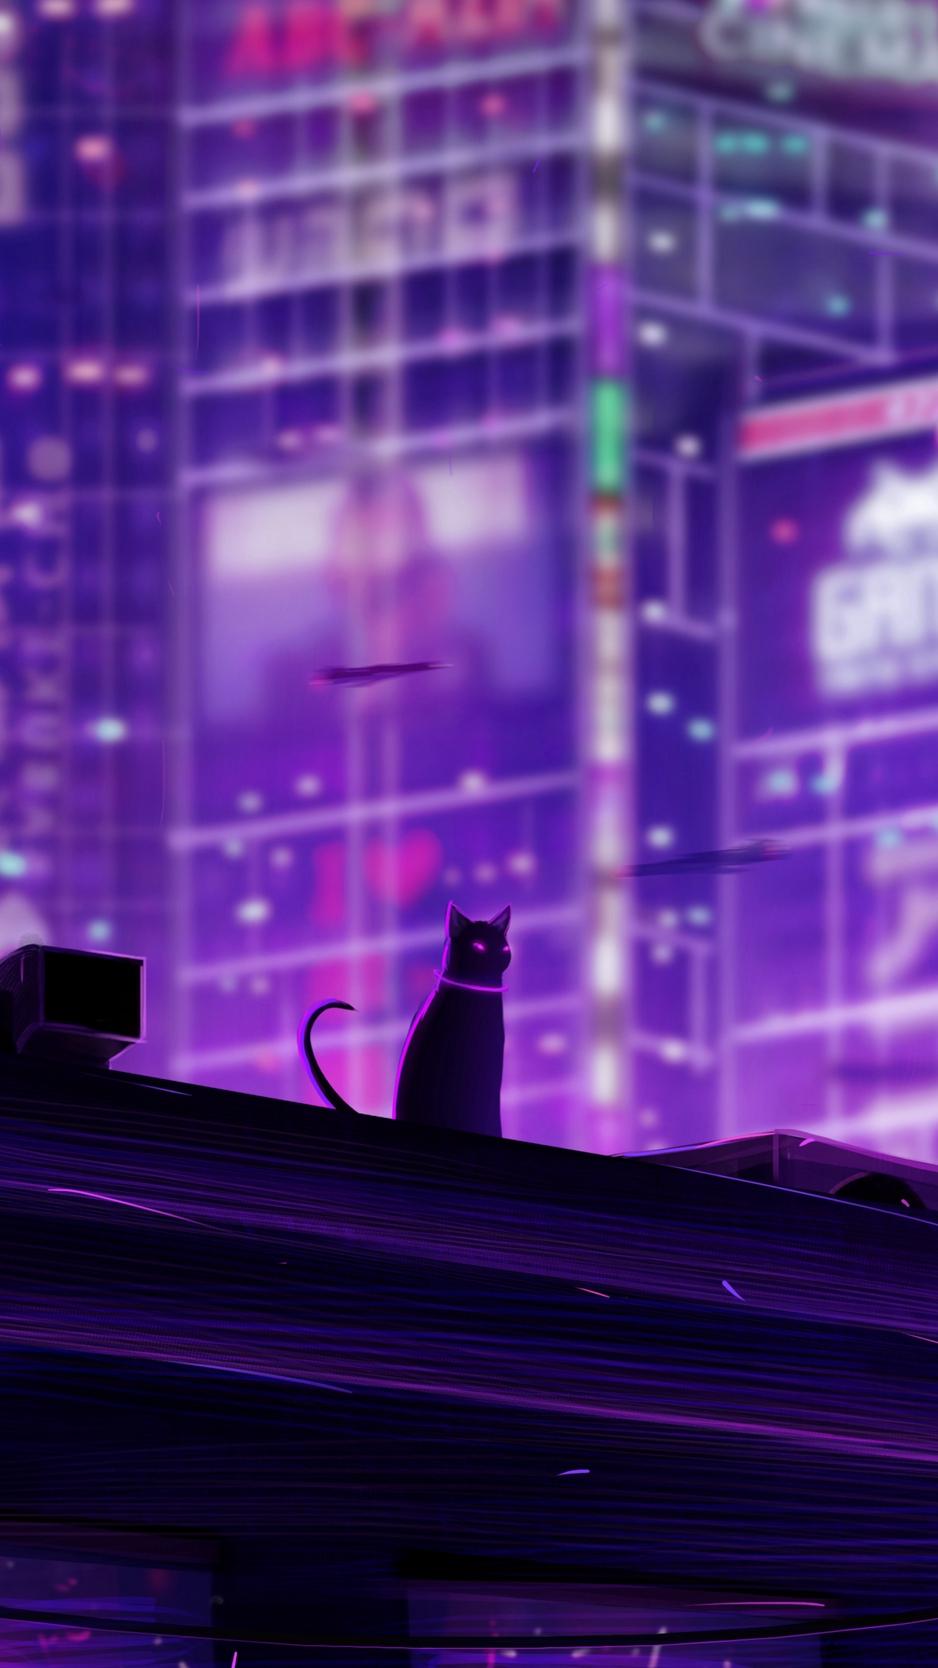 Wallpaper Cat Roof City Future Neon Backlight Neon City Wallpaper 4k 938x1668 Wallpaper Teahub Io